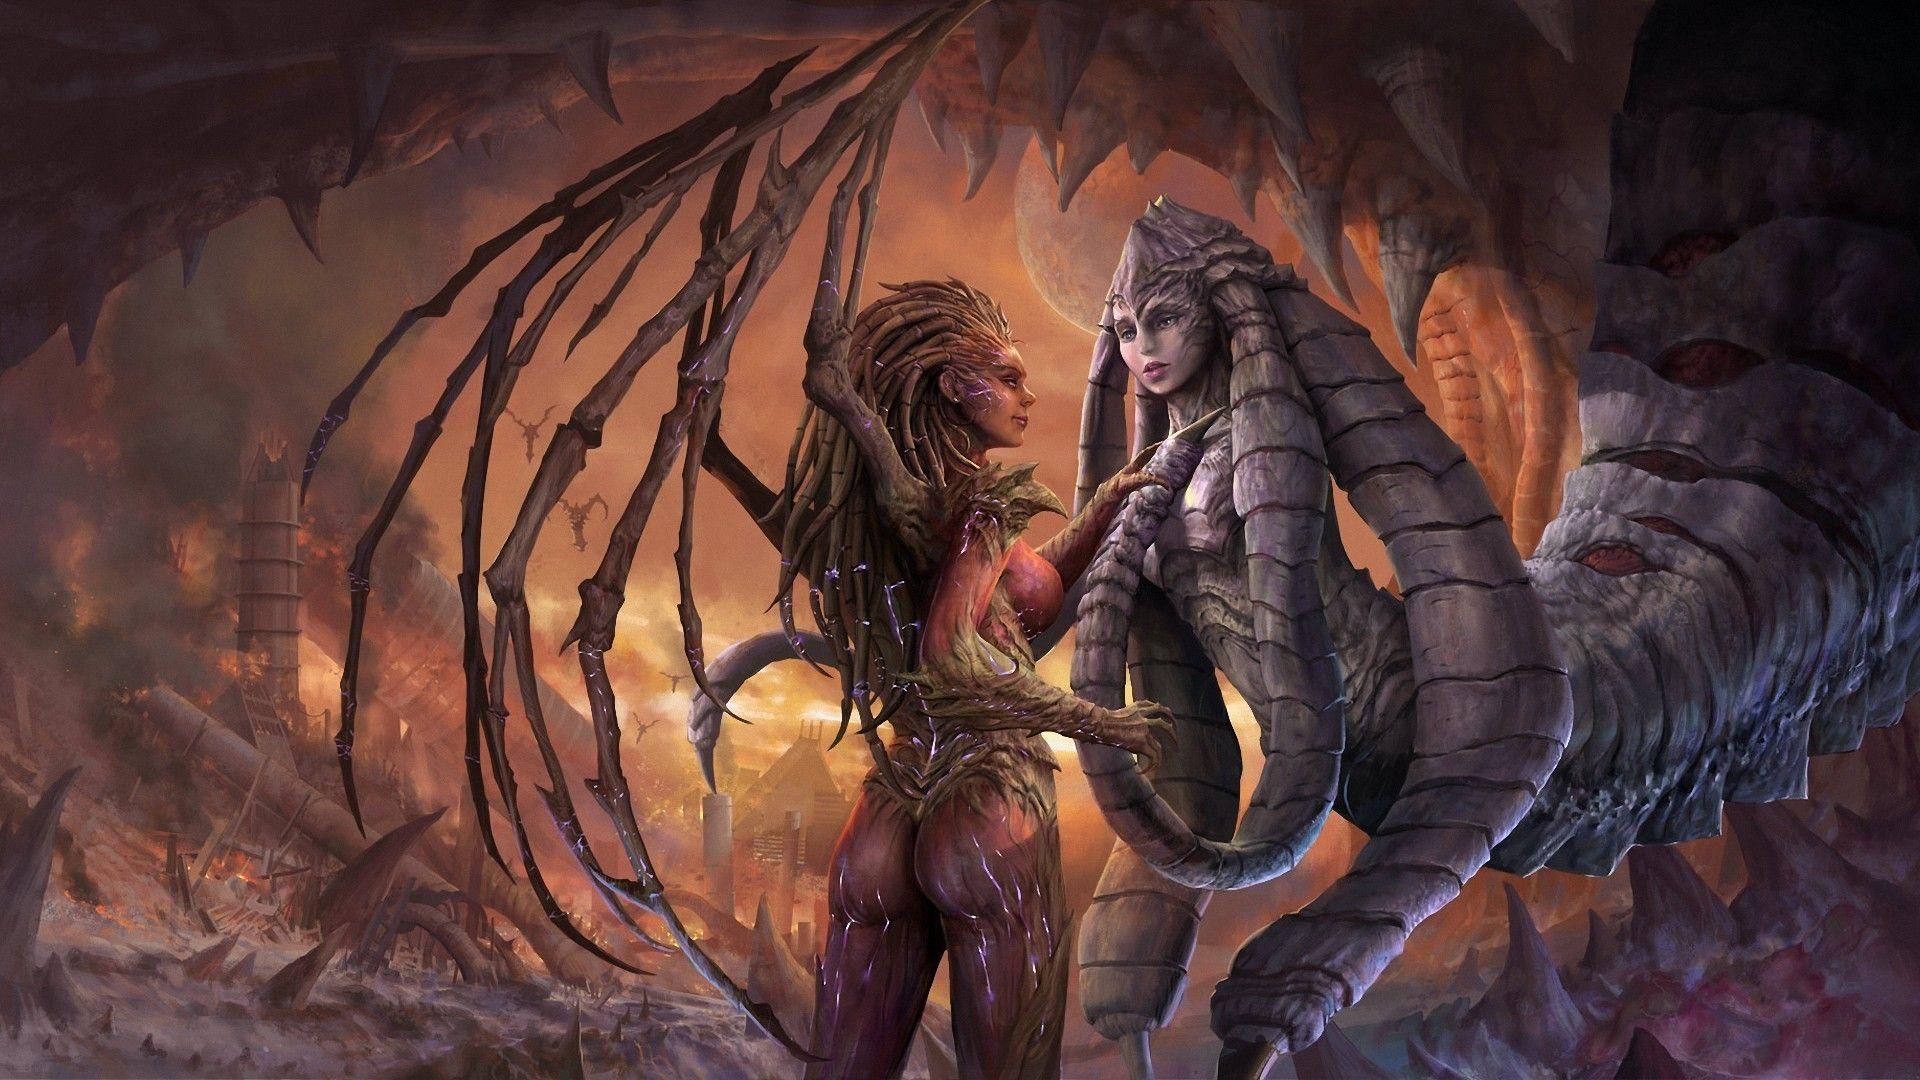 Pin by Alex Mercer on *Dragones* | Starcraft, Kerrigan